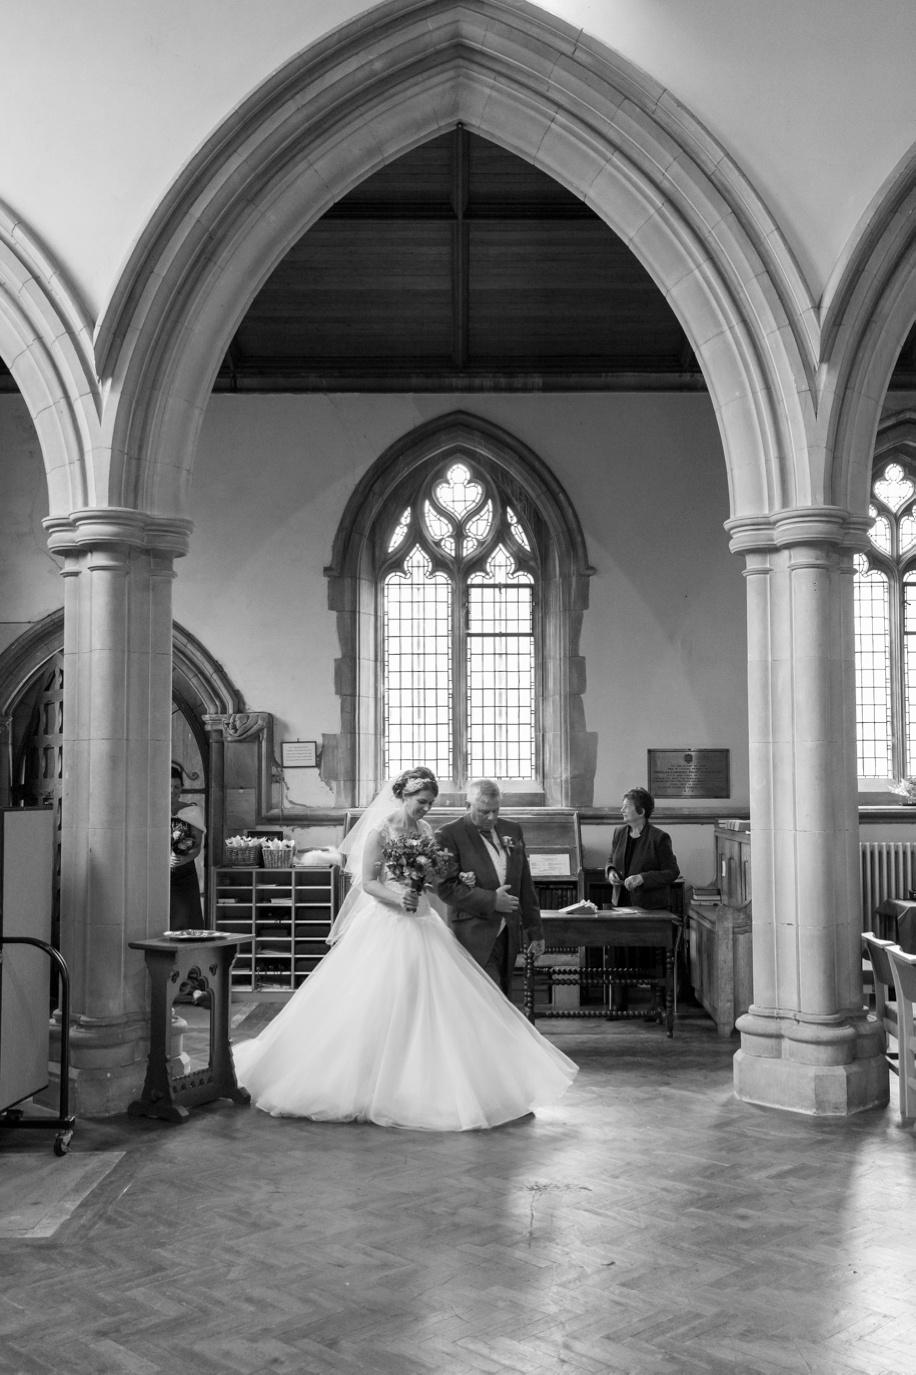 Wedding photographer Hampshire - St Thomas All Saints Church, Lyminton wedding - Bride walking down the aisle